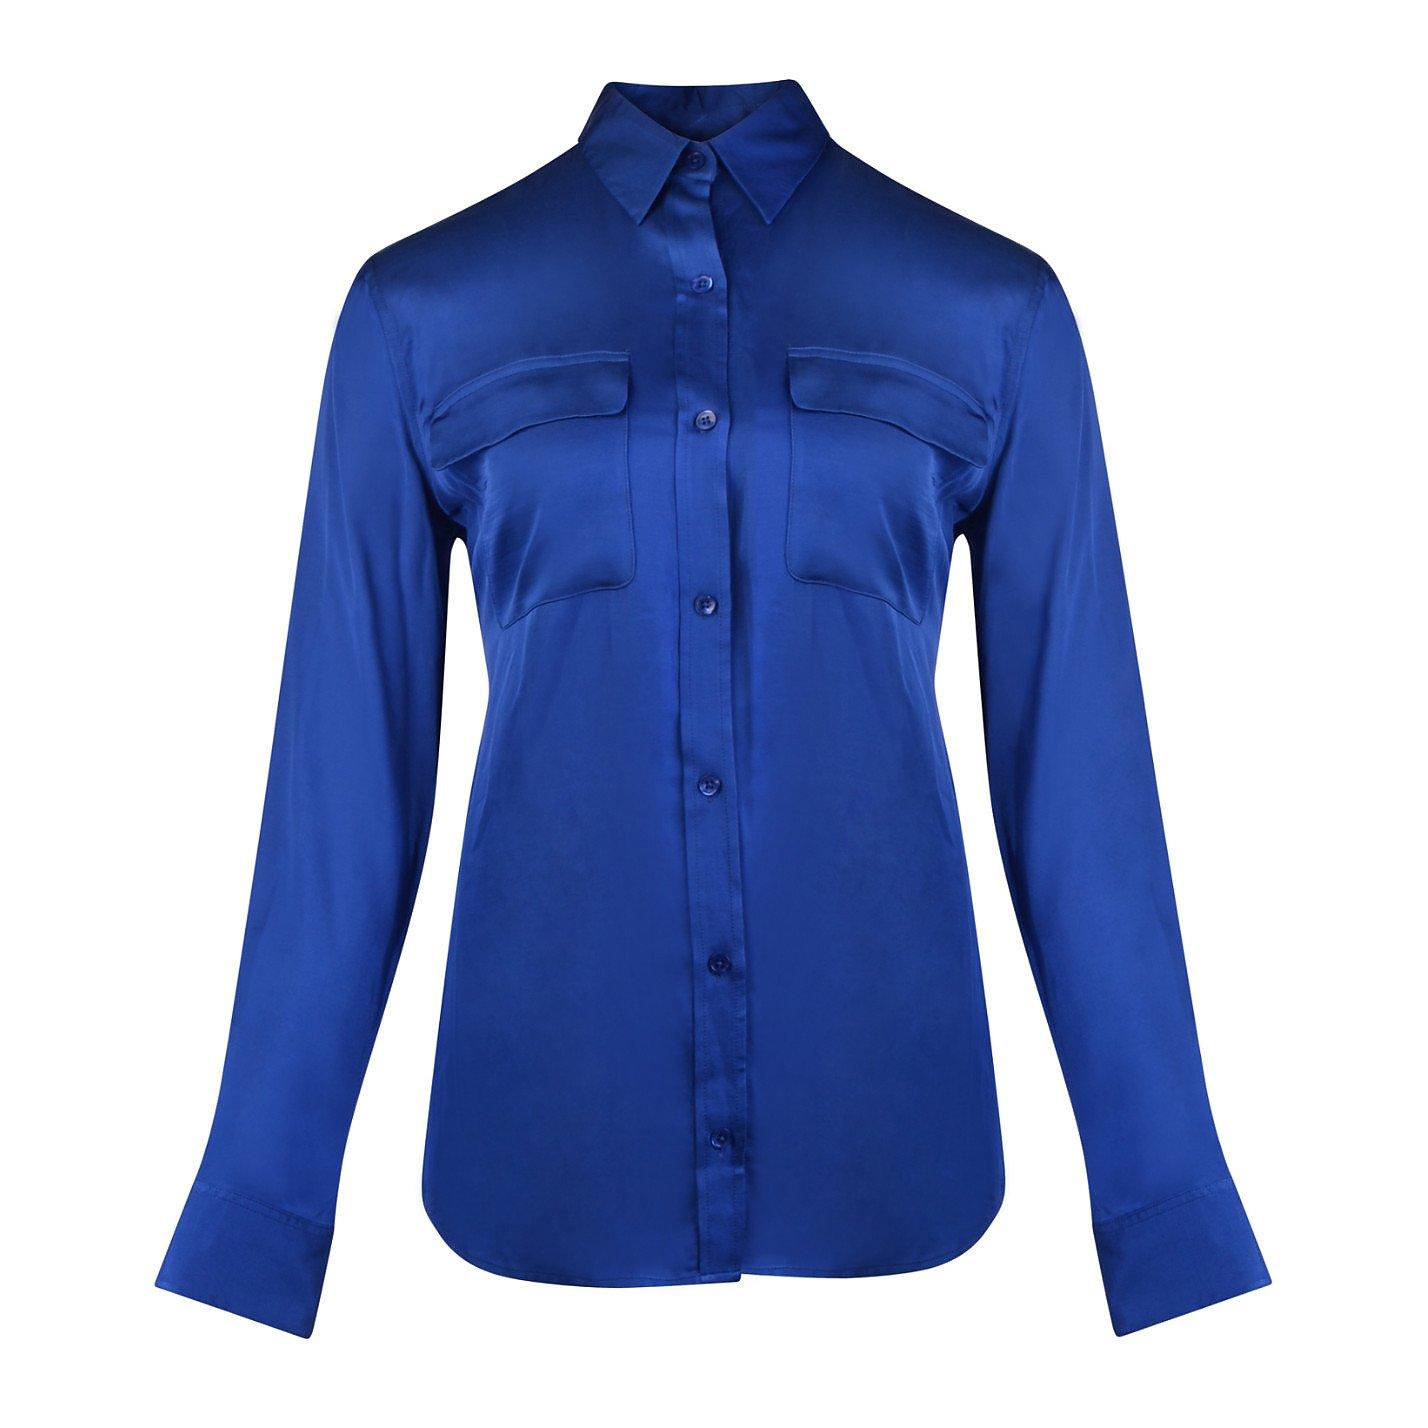 Equipment Satin Shirt With Pockets